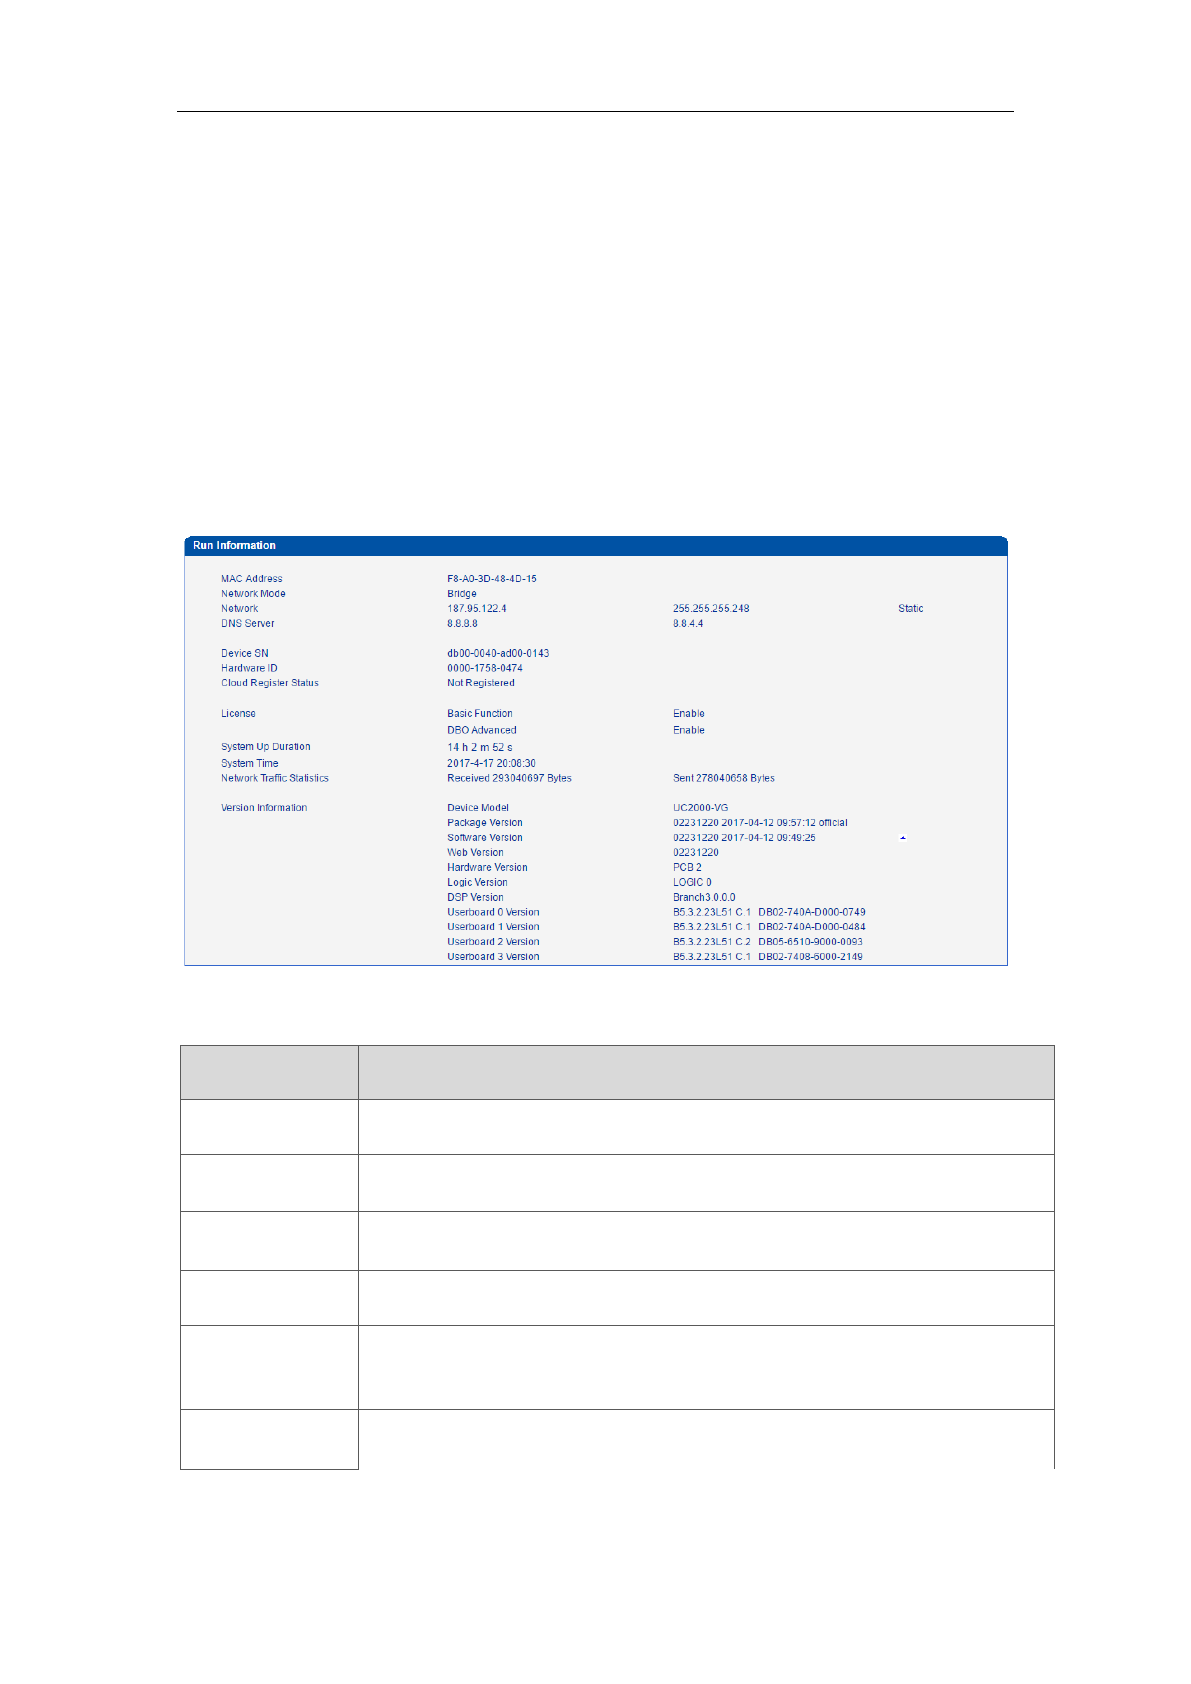 DXZC TECHNOLOGIES UC2000VF VOIP Gateway User Manual DWG